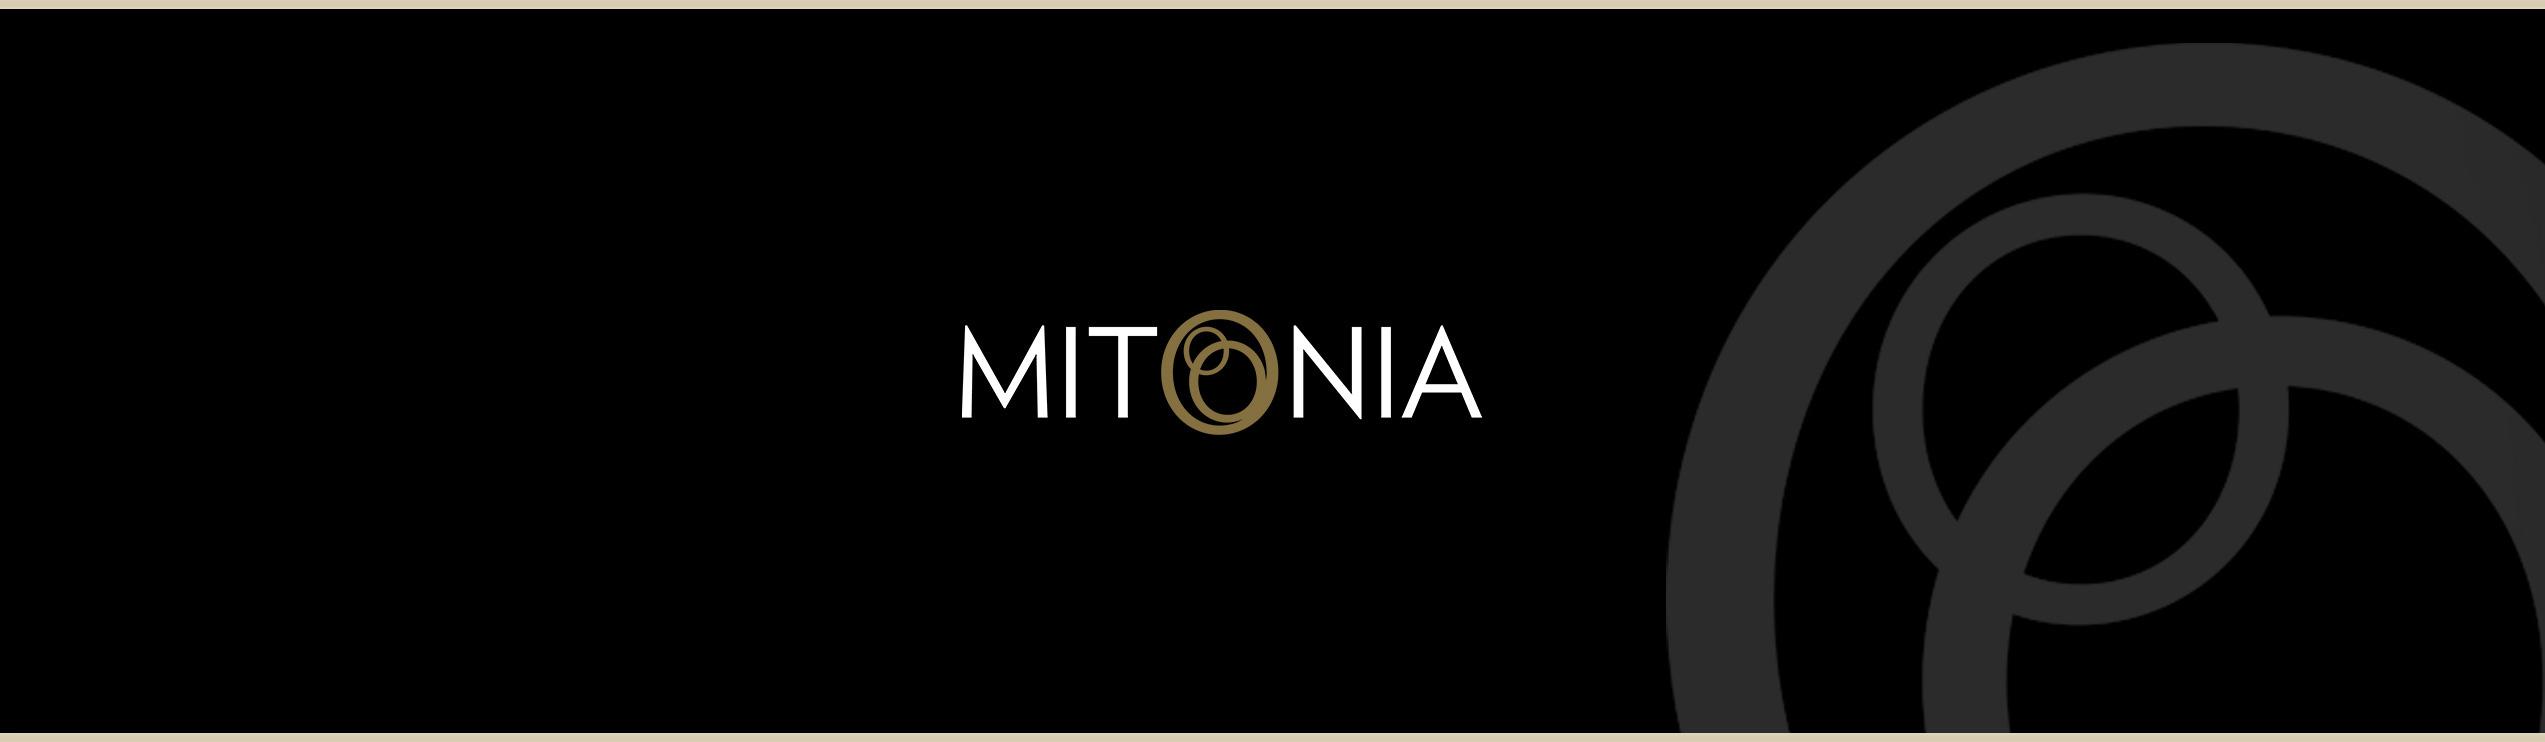 MitoniaBlack